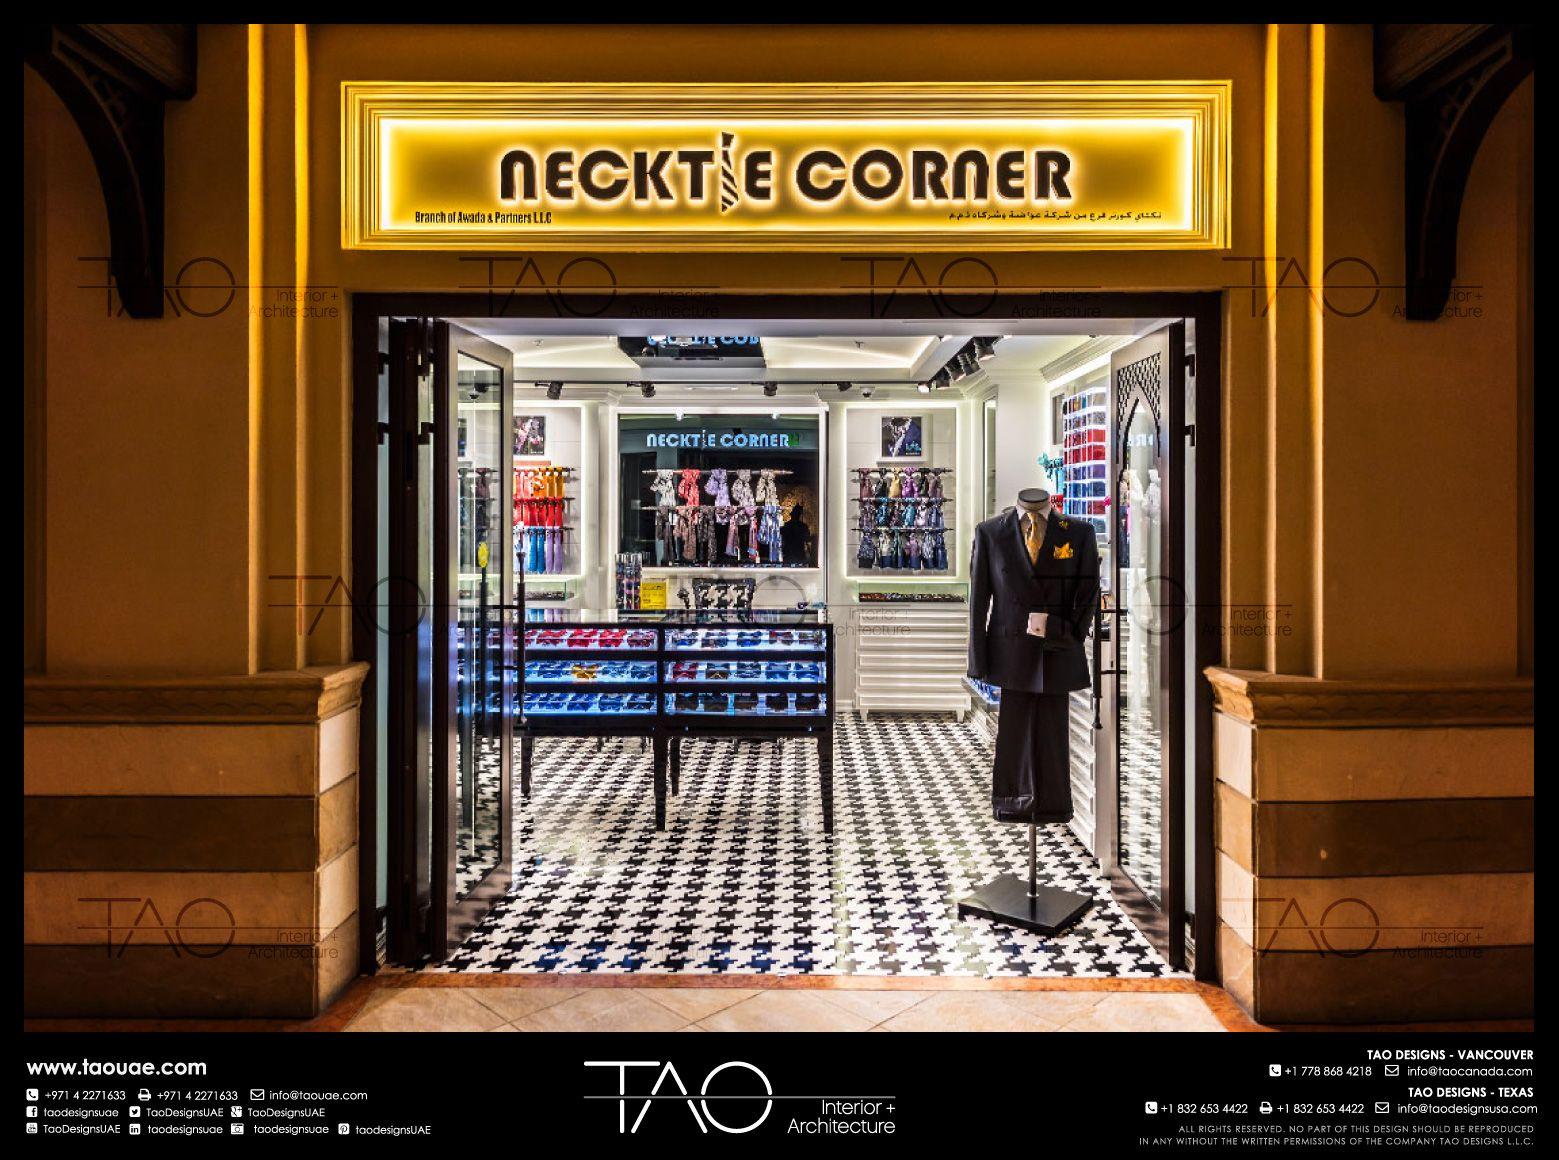 Necktie Corner Shop Front In Dubai Mall Dubai Uae By Tao Designs